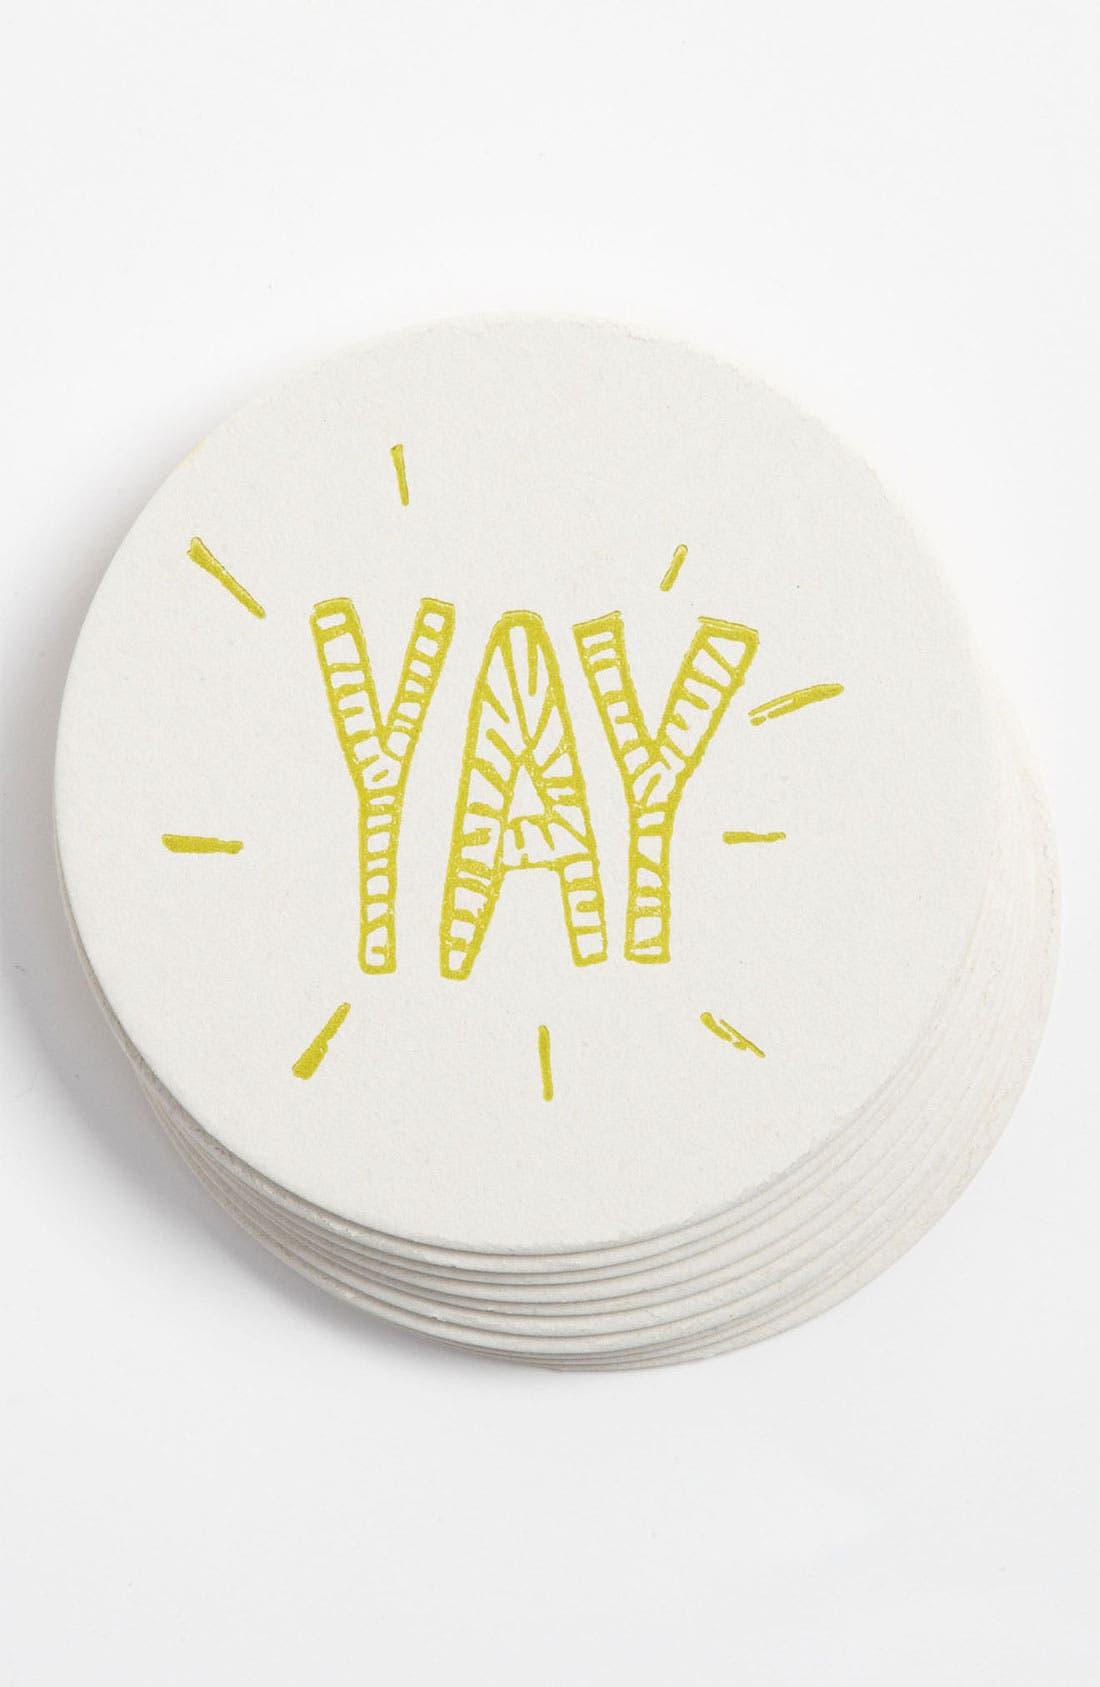 Main Image - 'Yay' Letterpress Coasters (Set of 10)